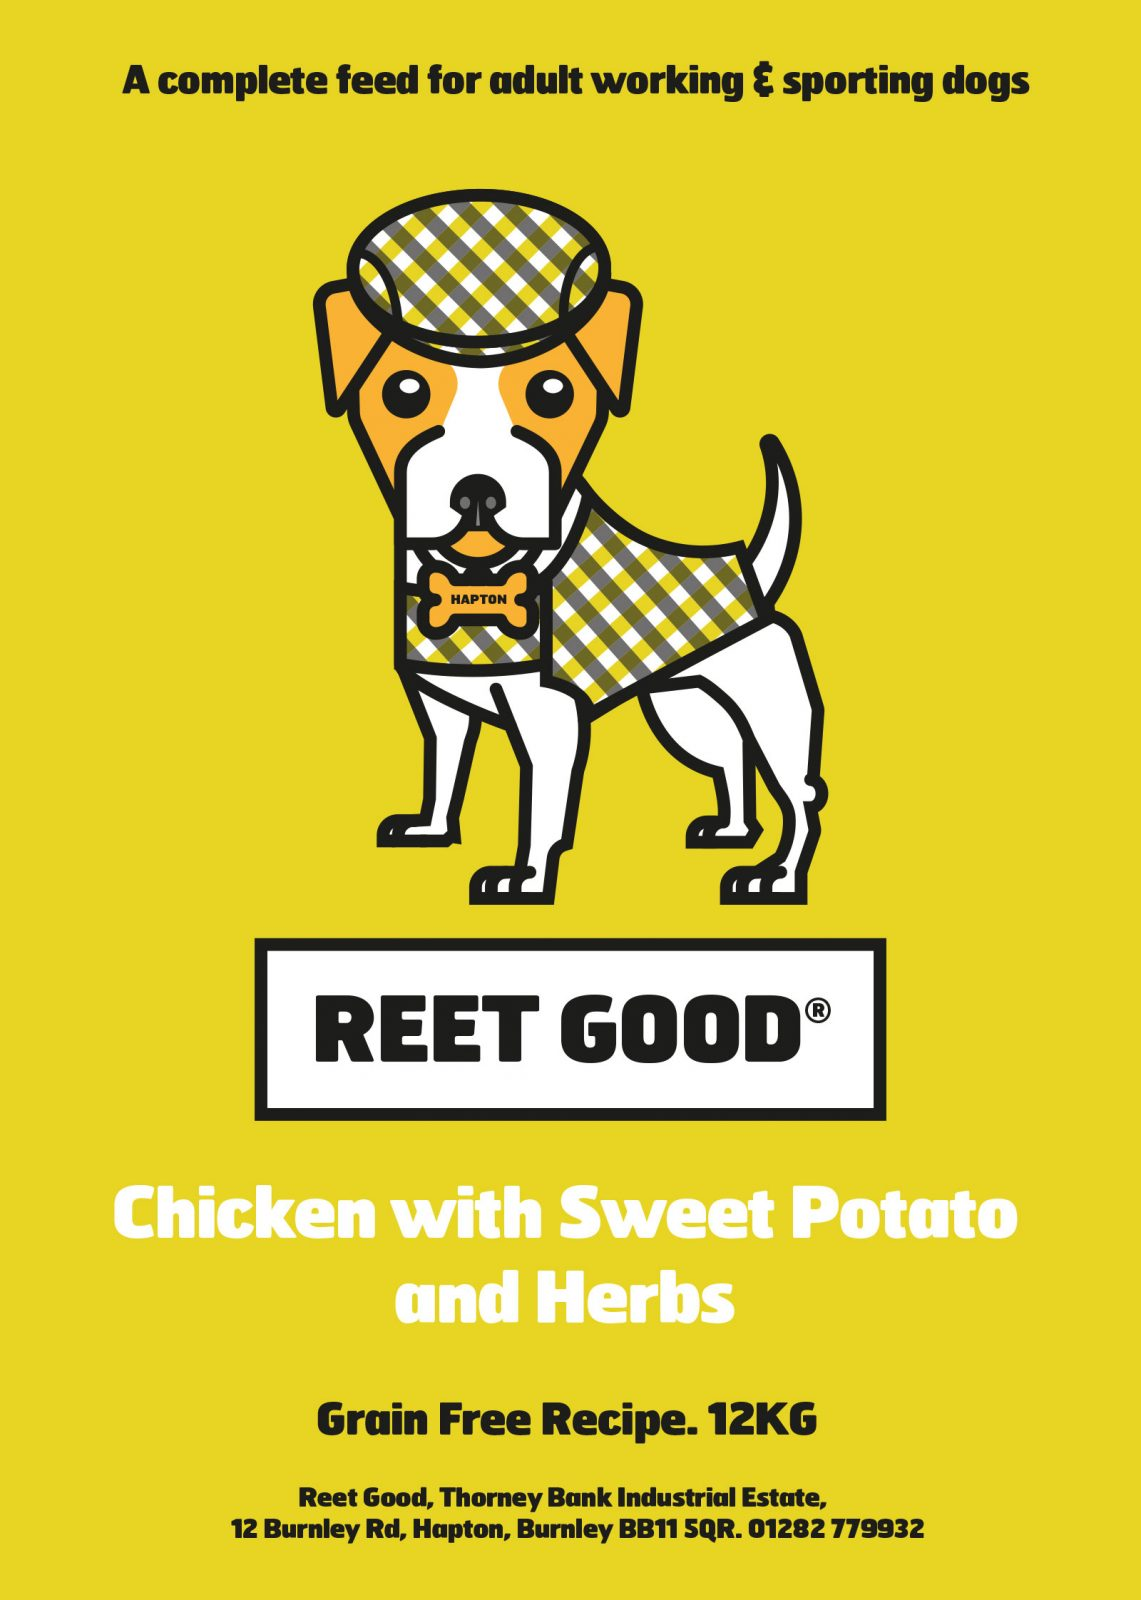 Chicken, Sweet Potato & Herbs